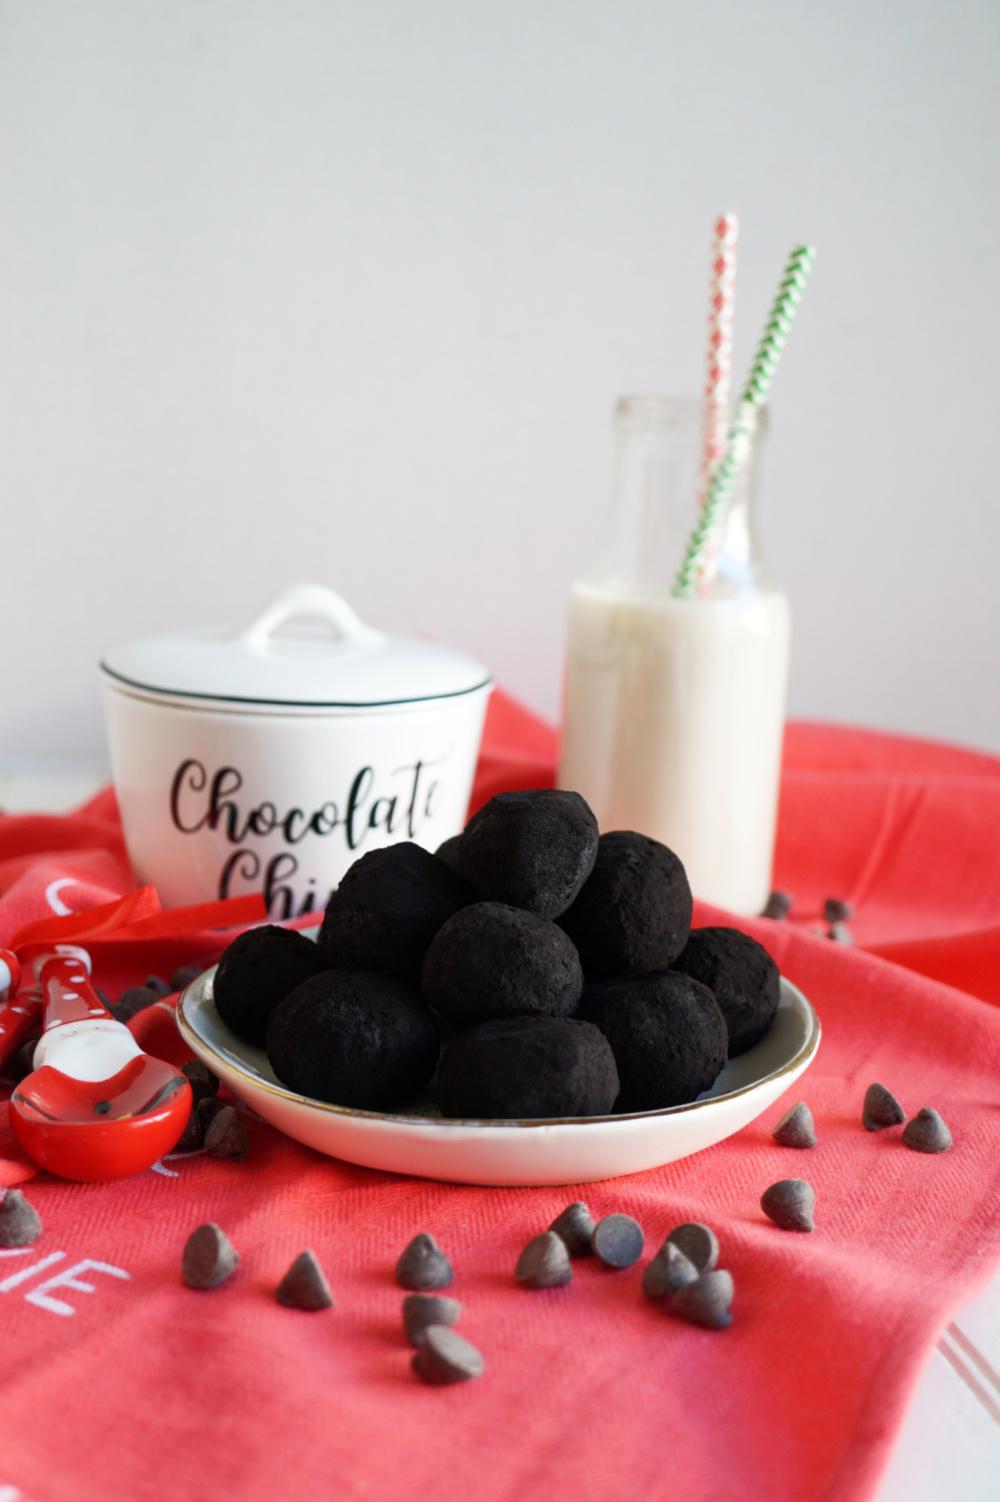 black chocolate truffles on plate